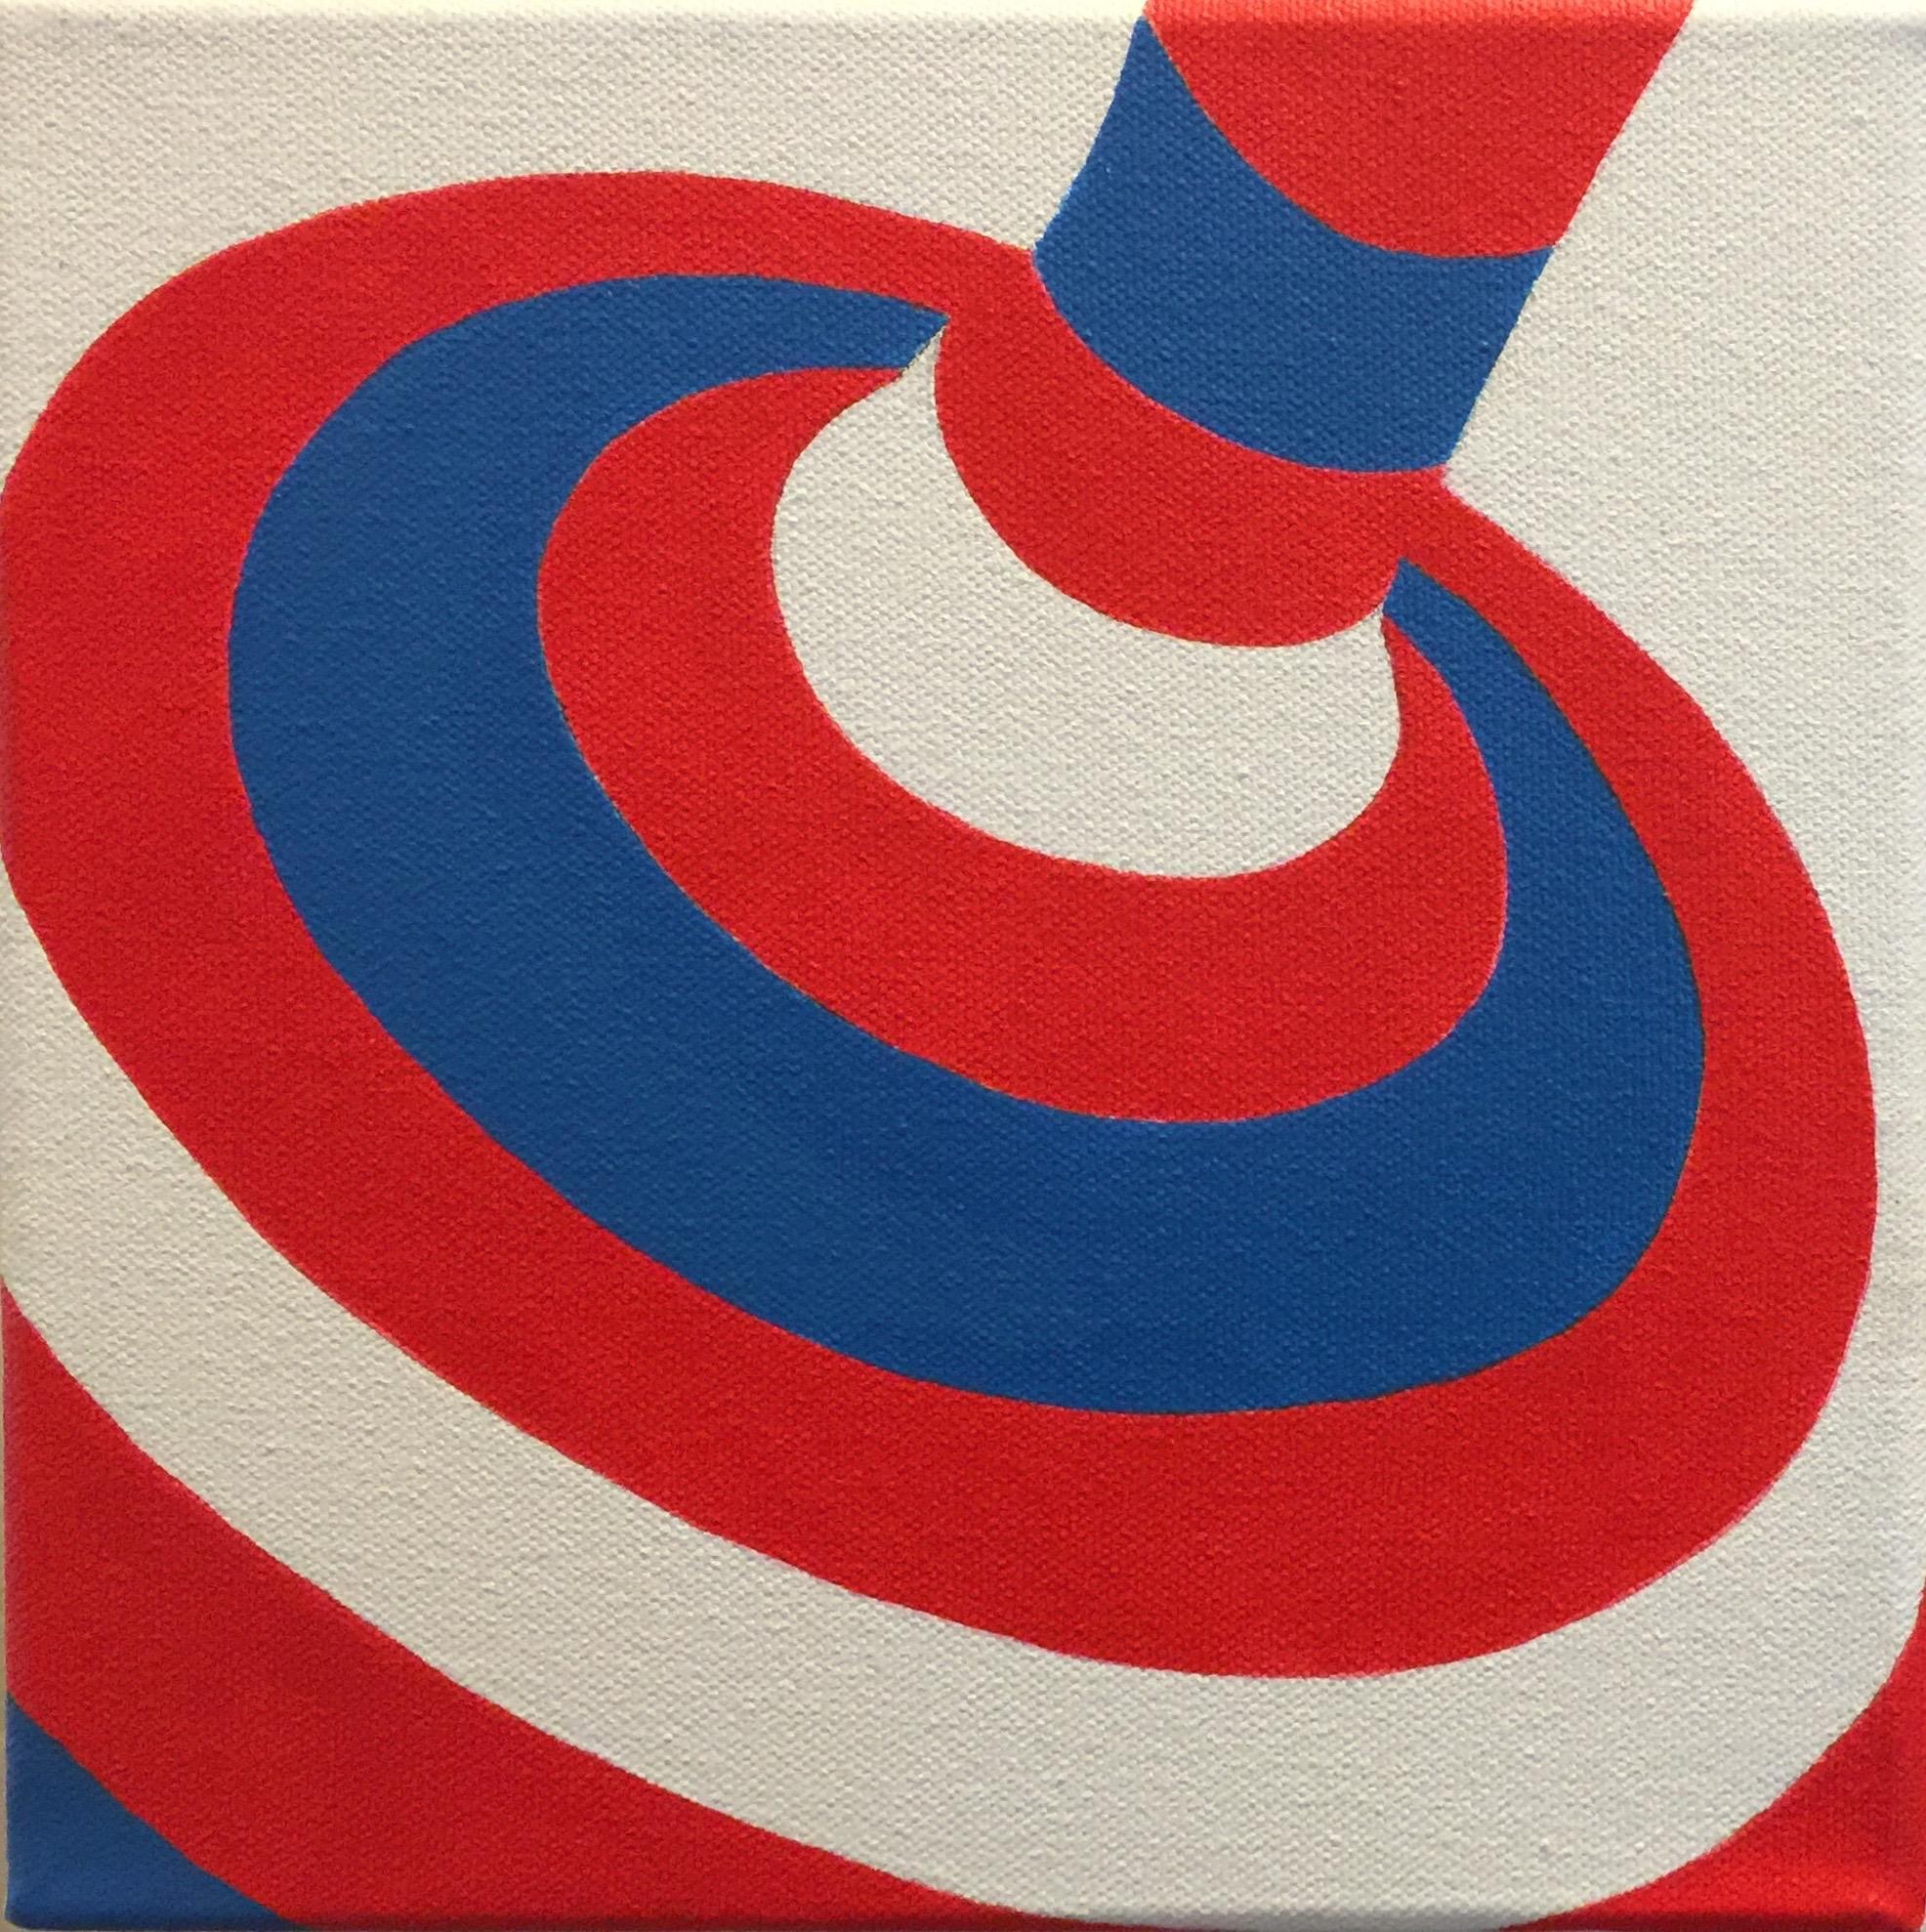 "Top #6 | H. 8"" W. 8"" | Acrylic on canvas | 2016"